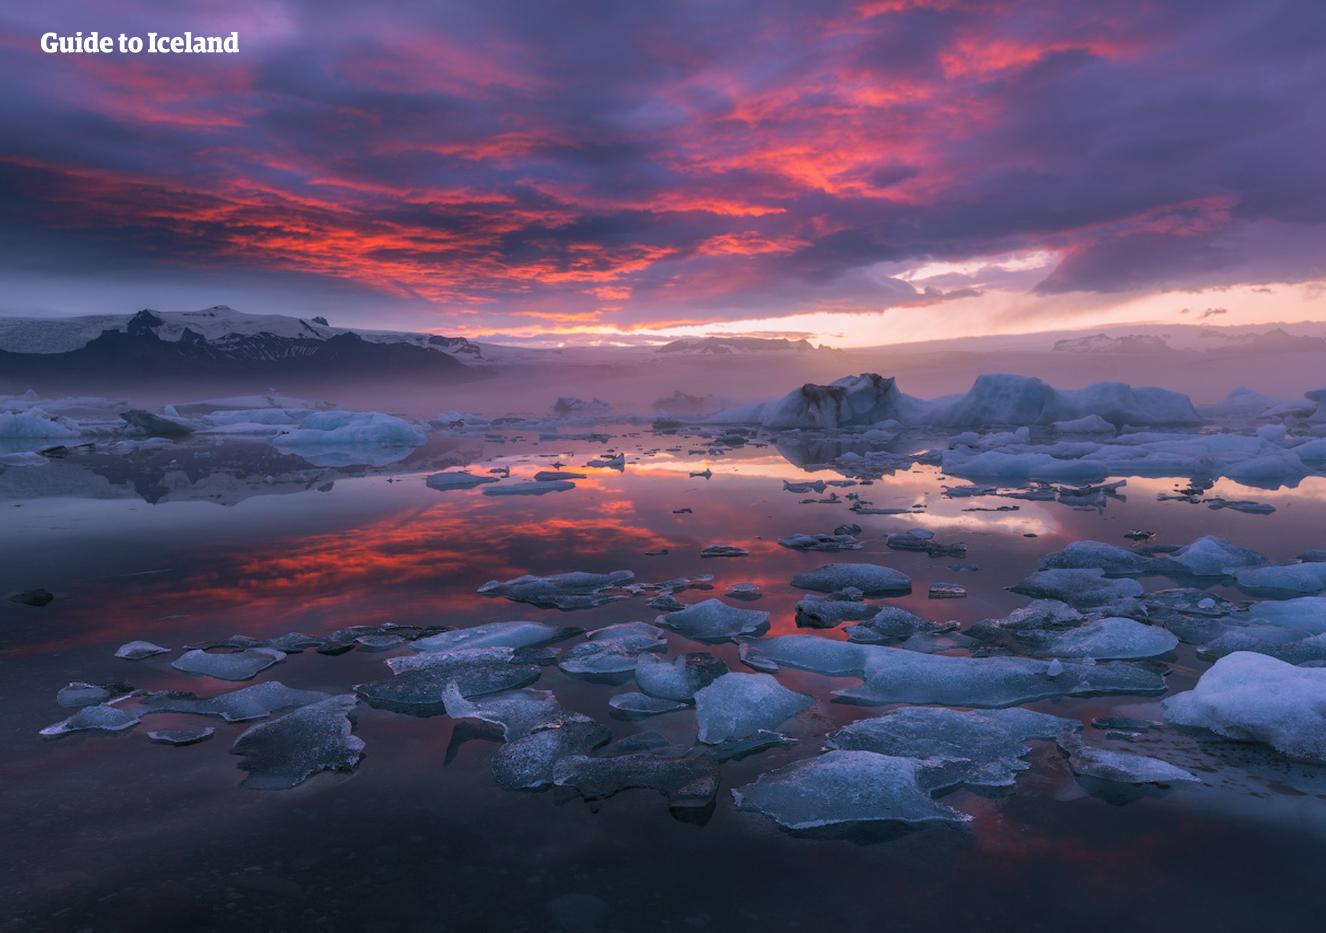 Isbrelagunen Jökulsárlón er en av Islands vakreste naturattraksjoner.